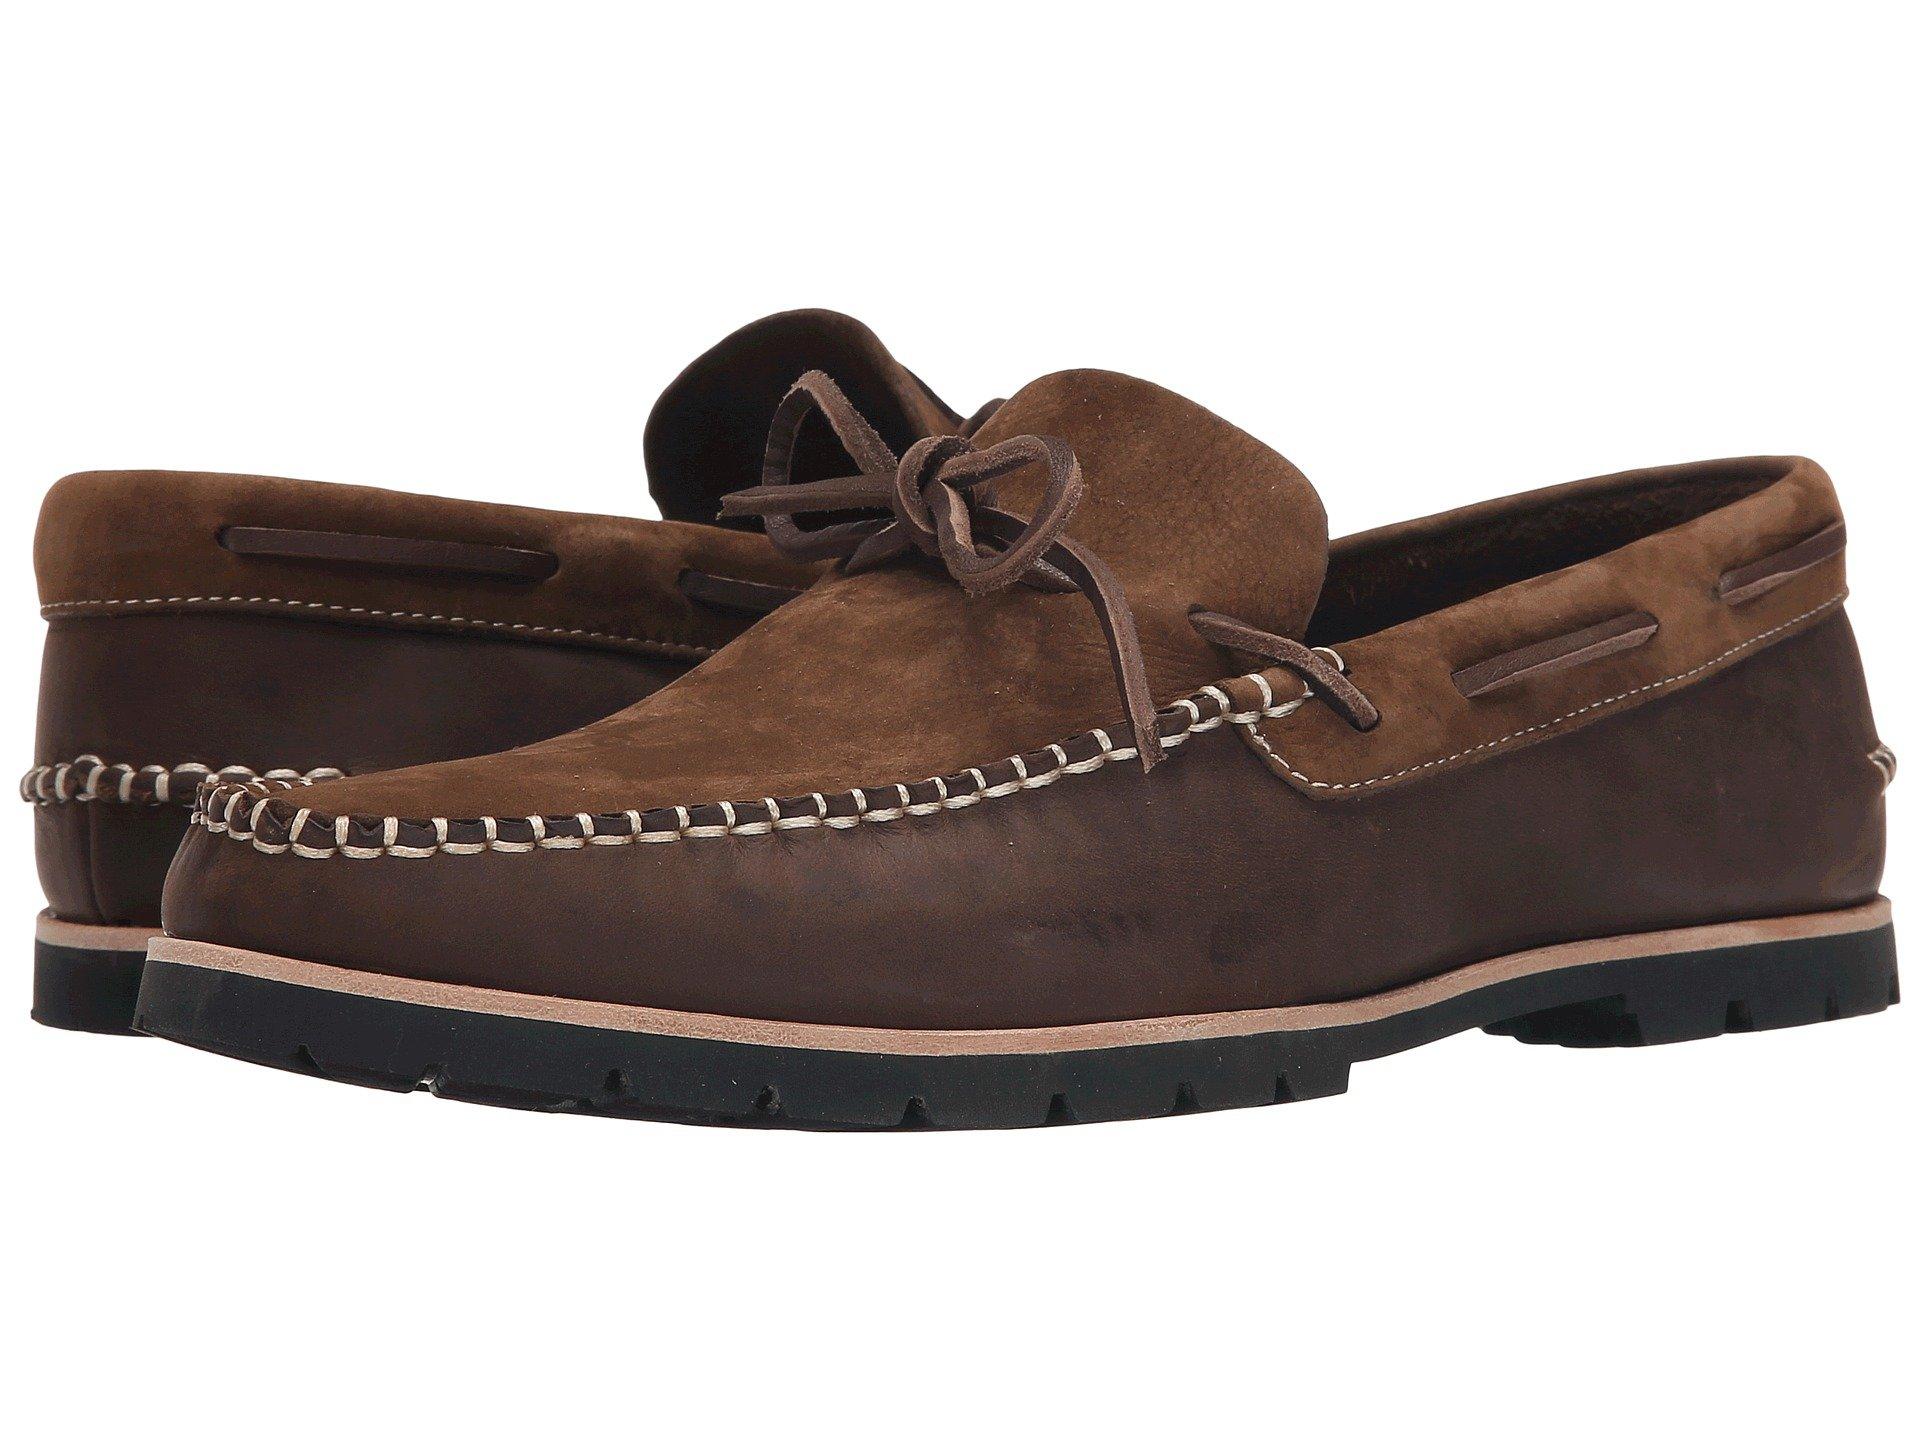 Calzado Tipo Boat Shoe para Hombre Woolrich Lake House  + Woolrich en VeoyCompro.net